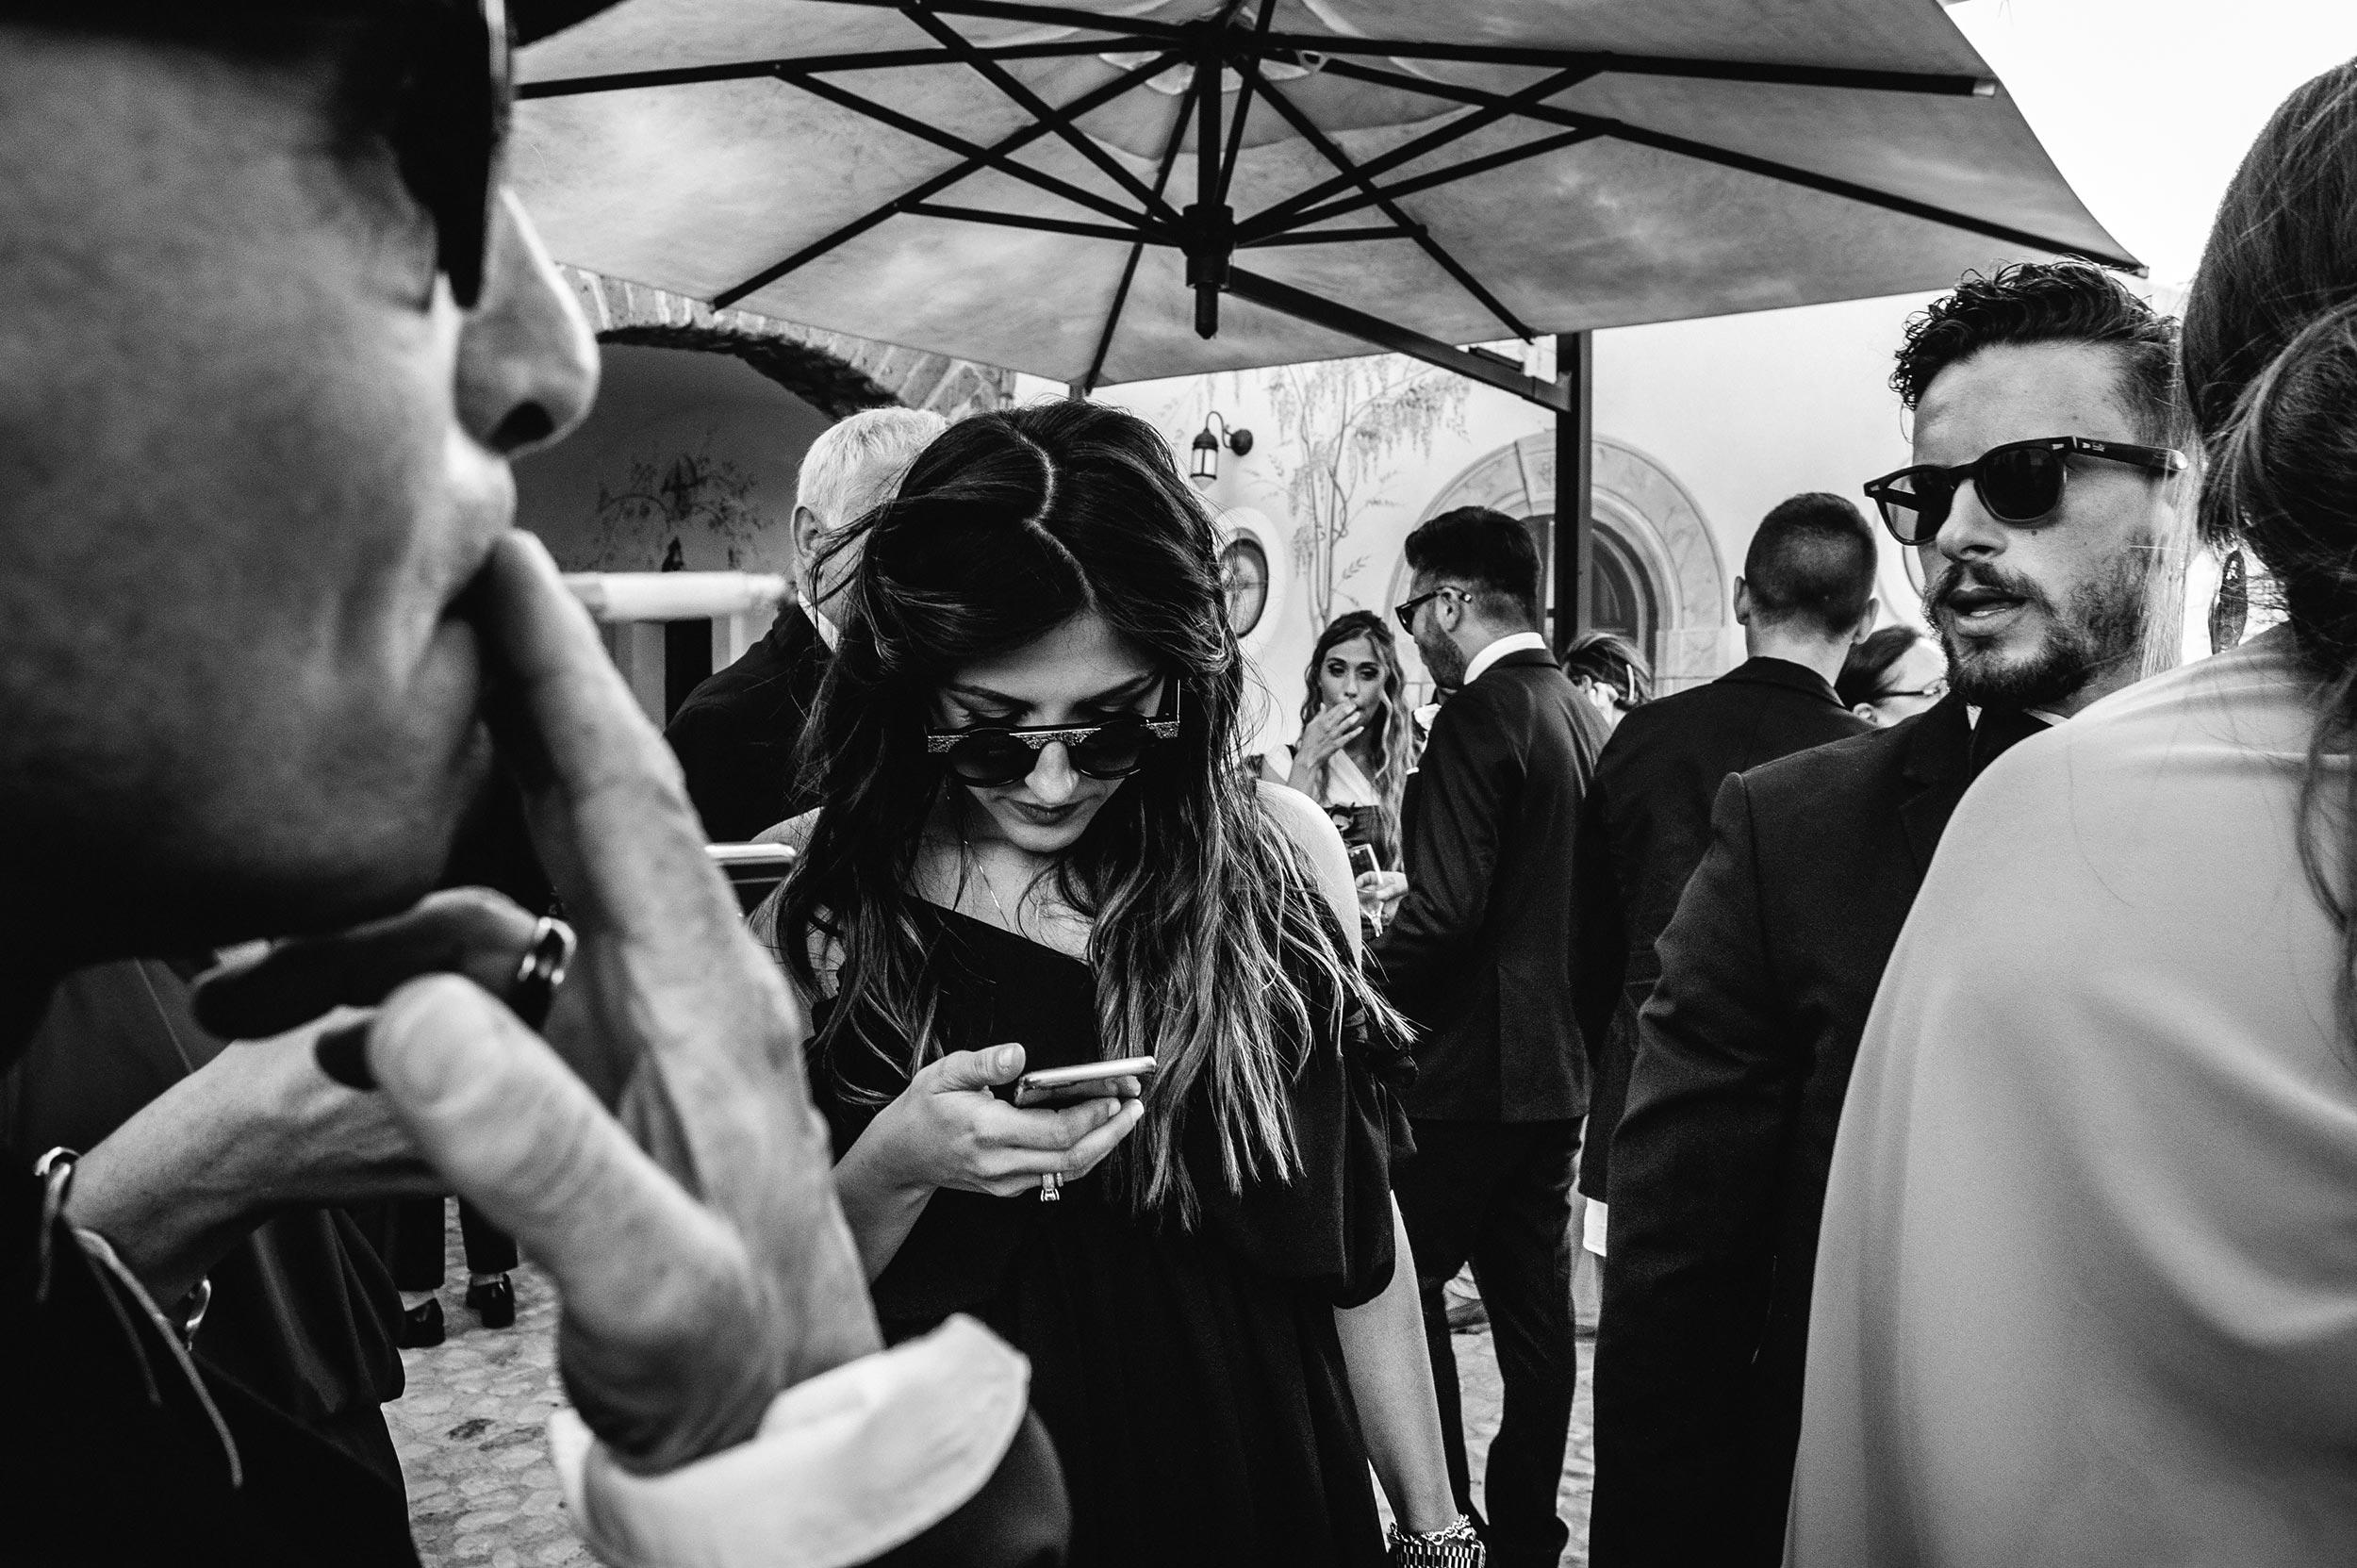 2016-Claudio-Teresa-Naples-Wedding-Photographer-Italy-Alessandro-Avenali-69.jpg